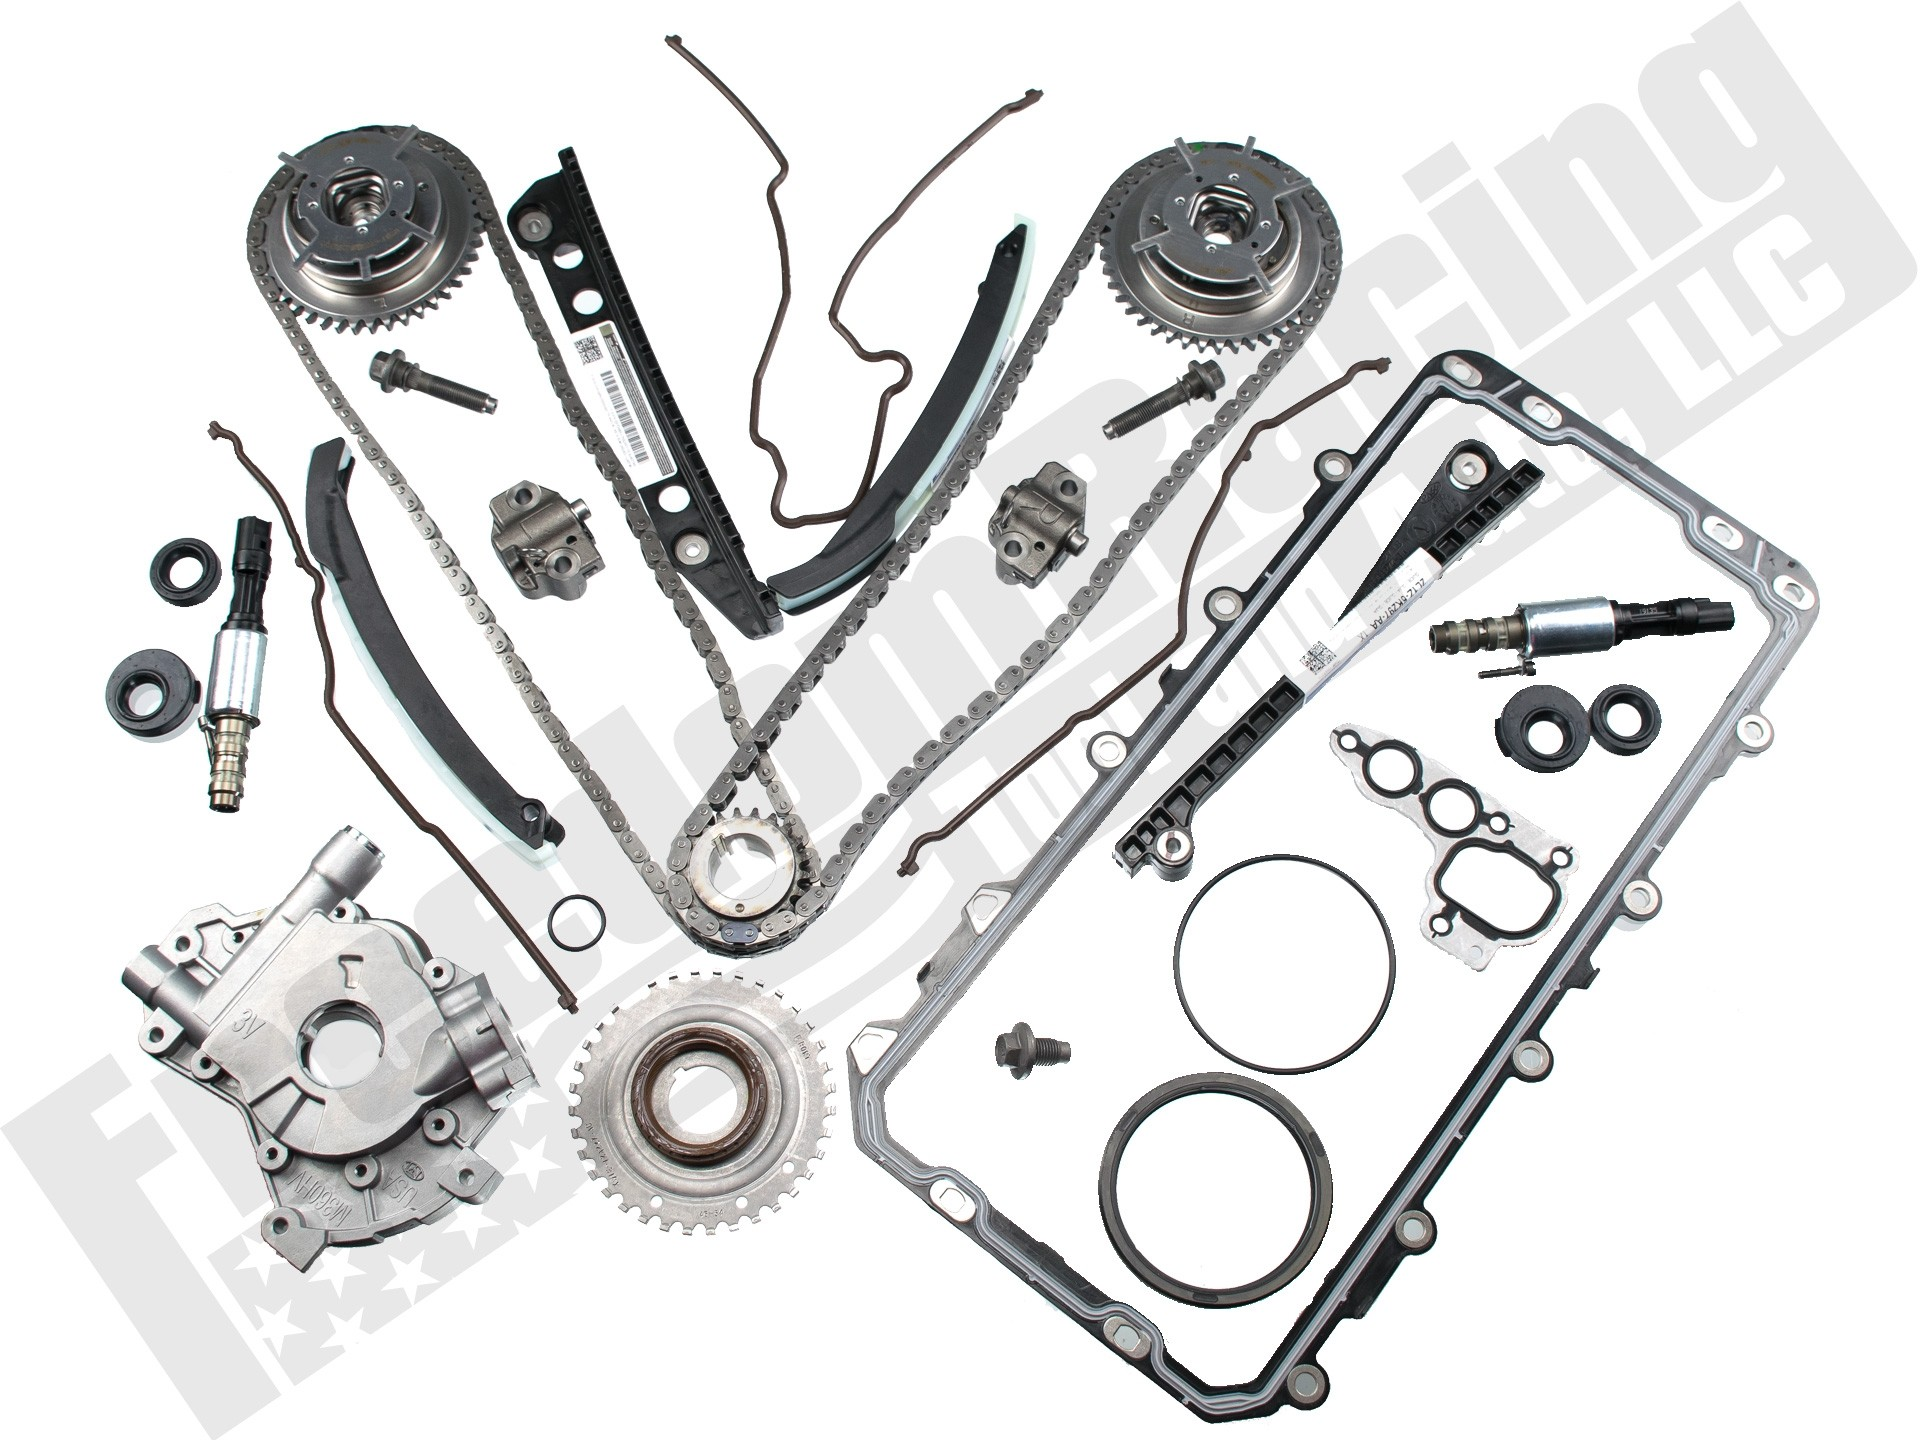 5.4L 3V 2004-2010 Ford OEM Cam Phaser, Timing Chain, Ford